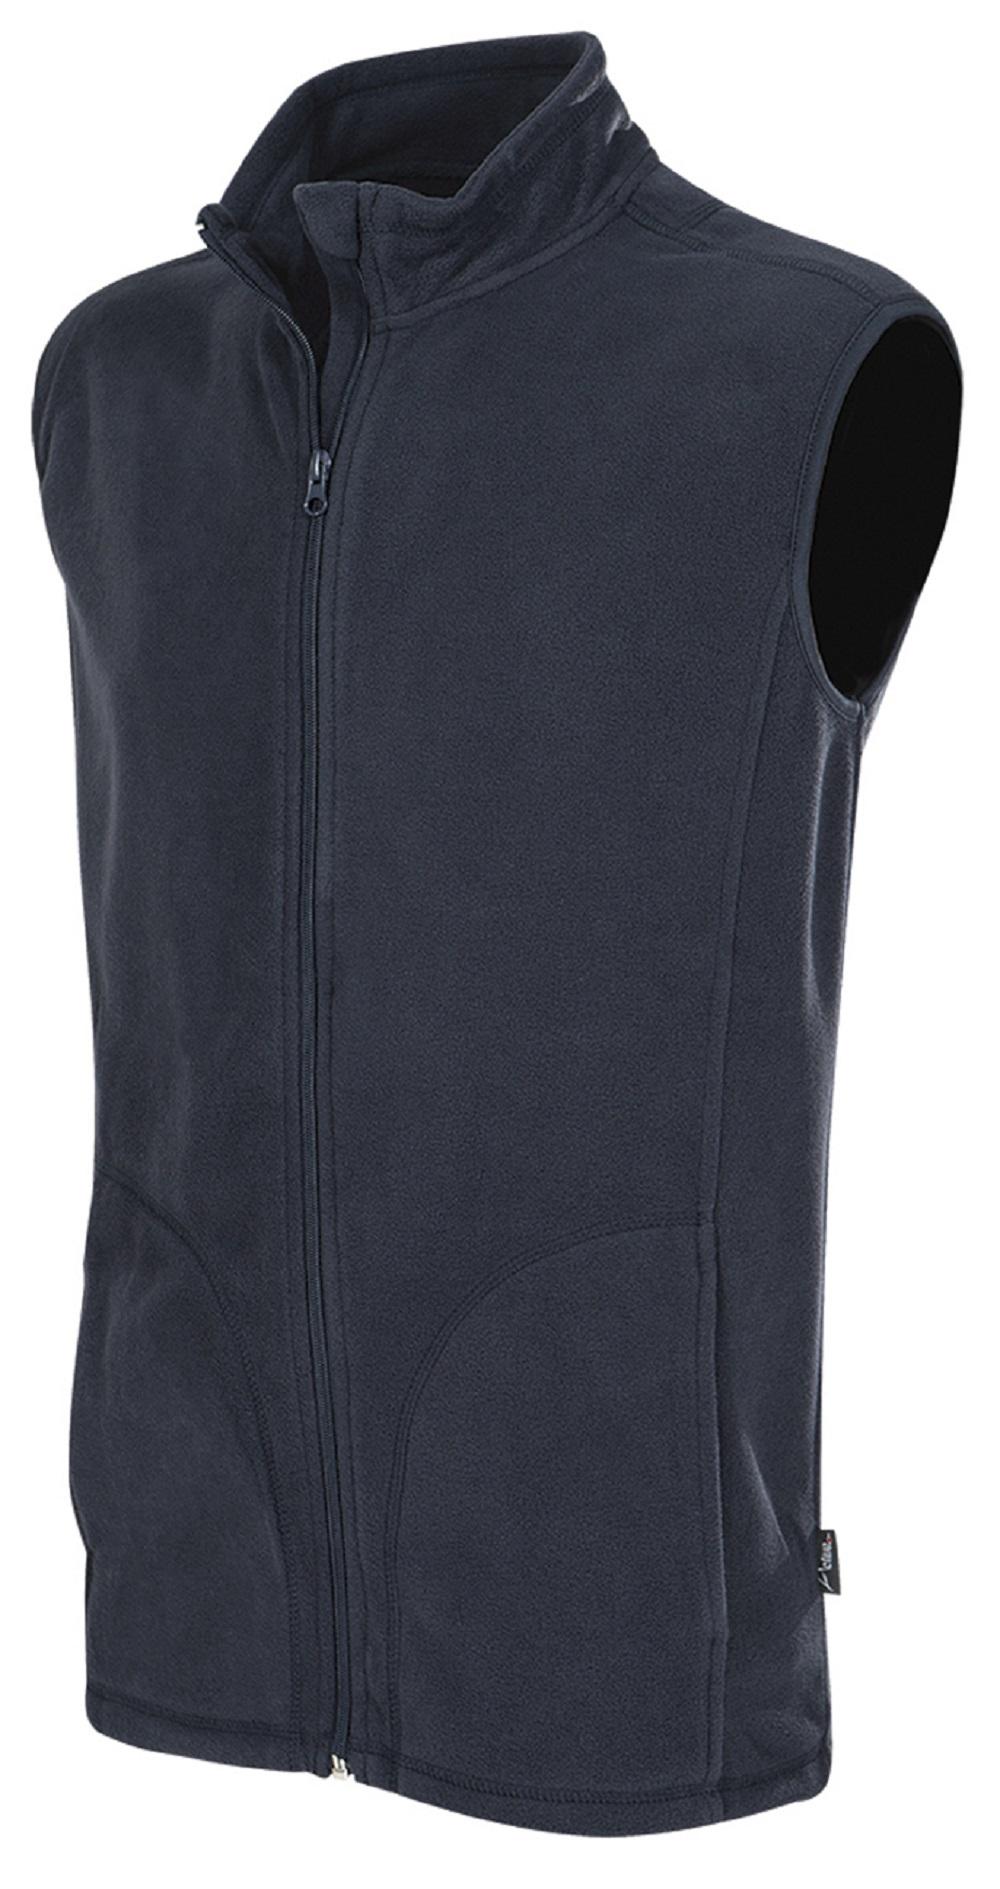 active vest blue midnight